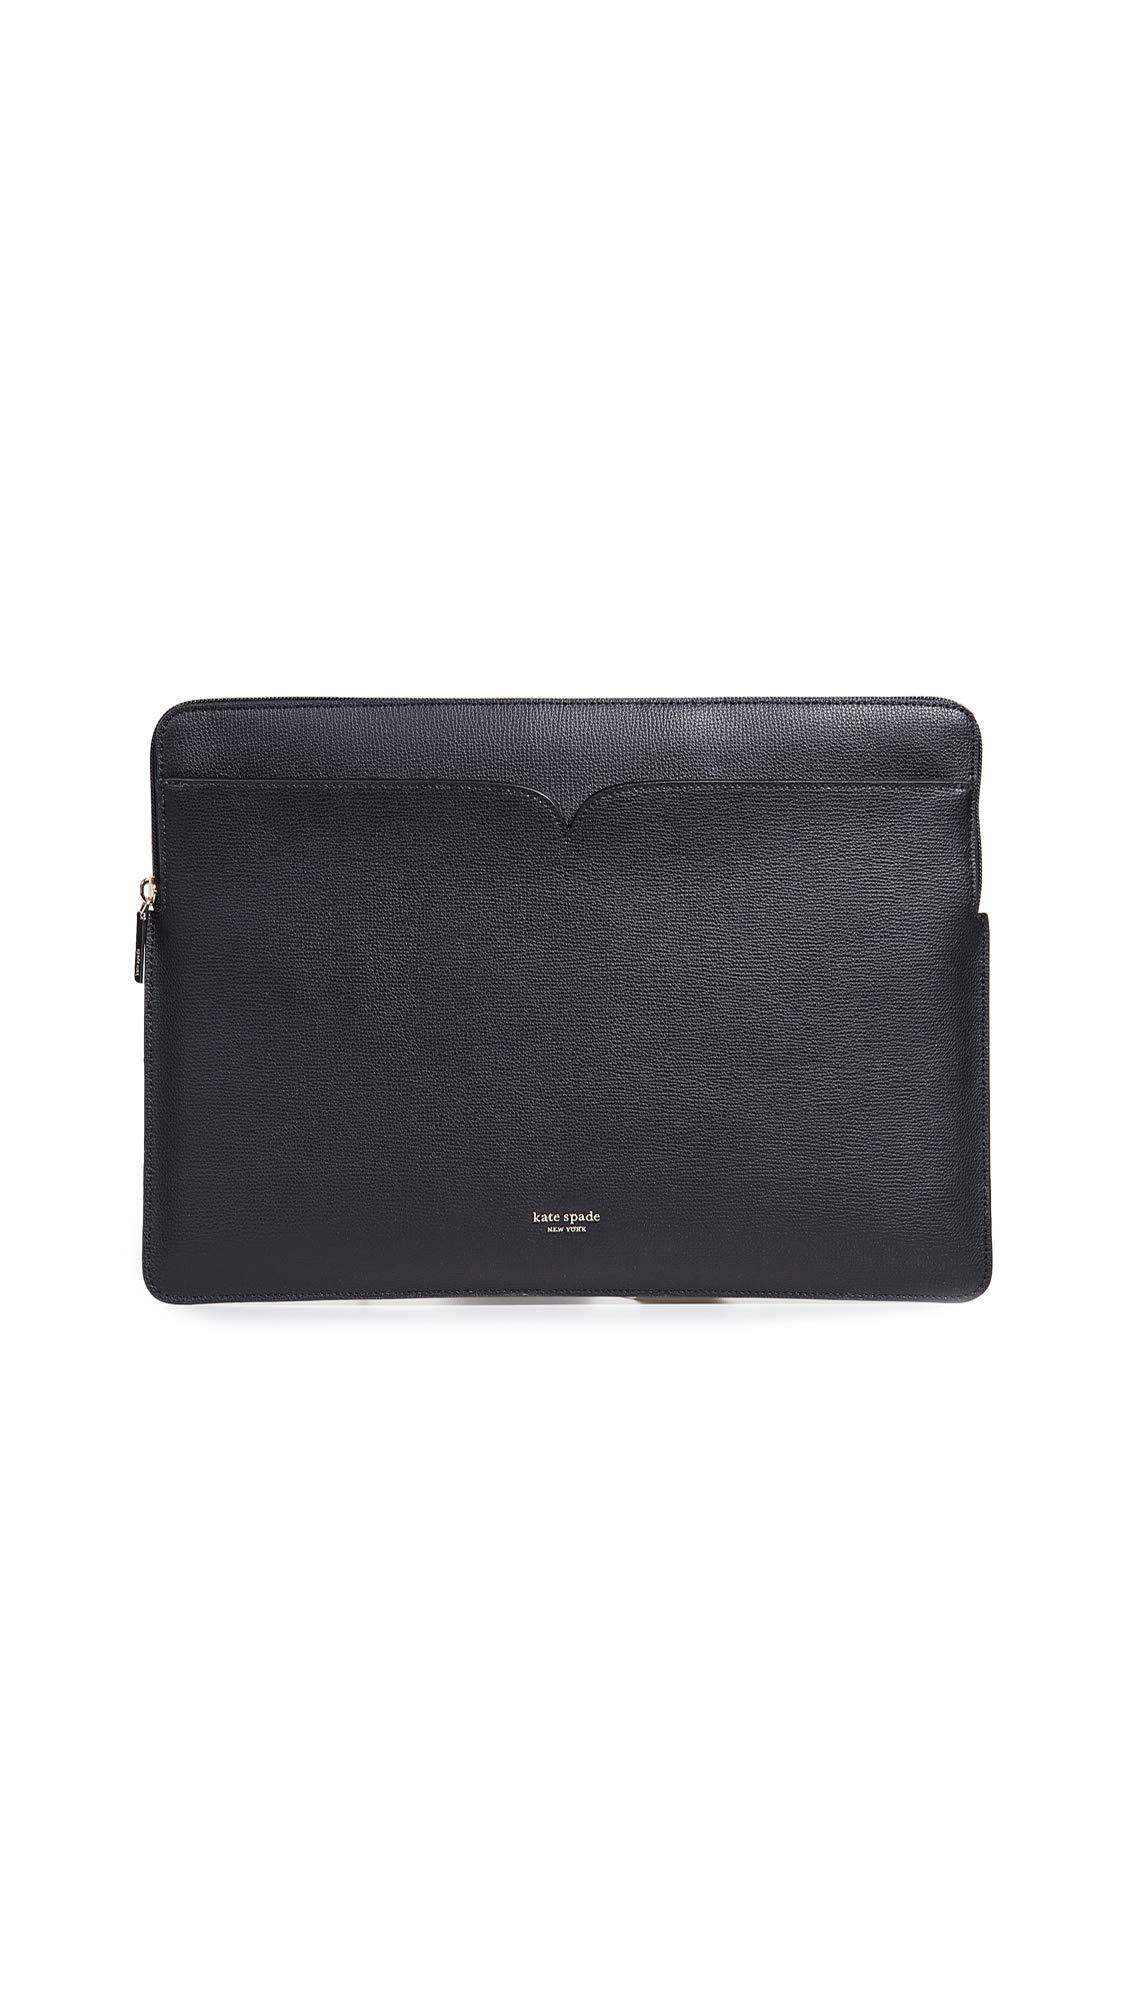 Kate Spade New York Sylvia Universal Slim Laptop Sleeve, Black, One Size